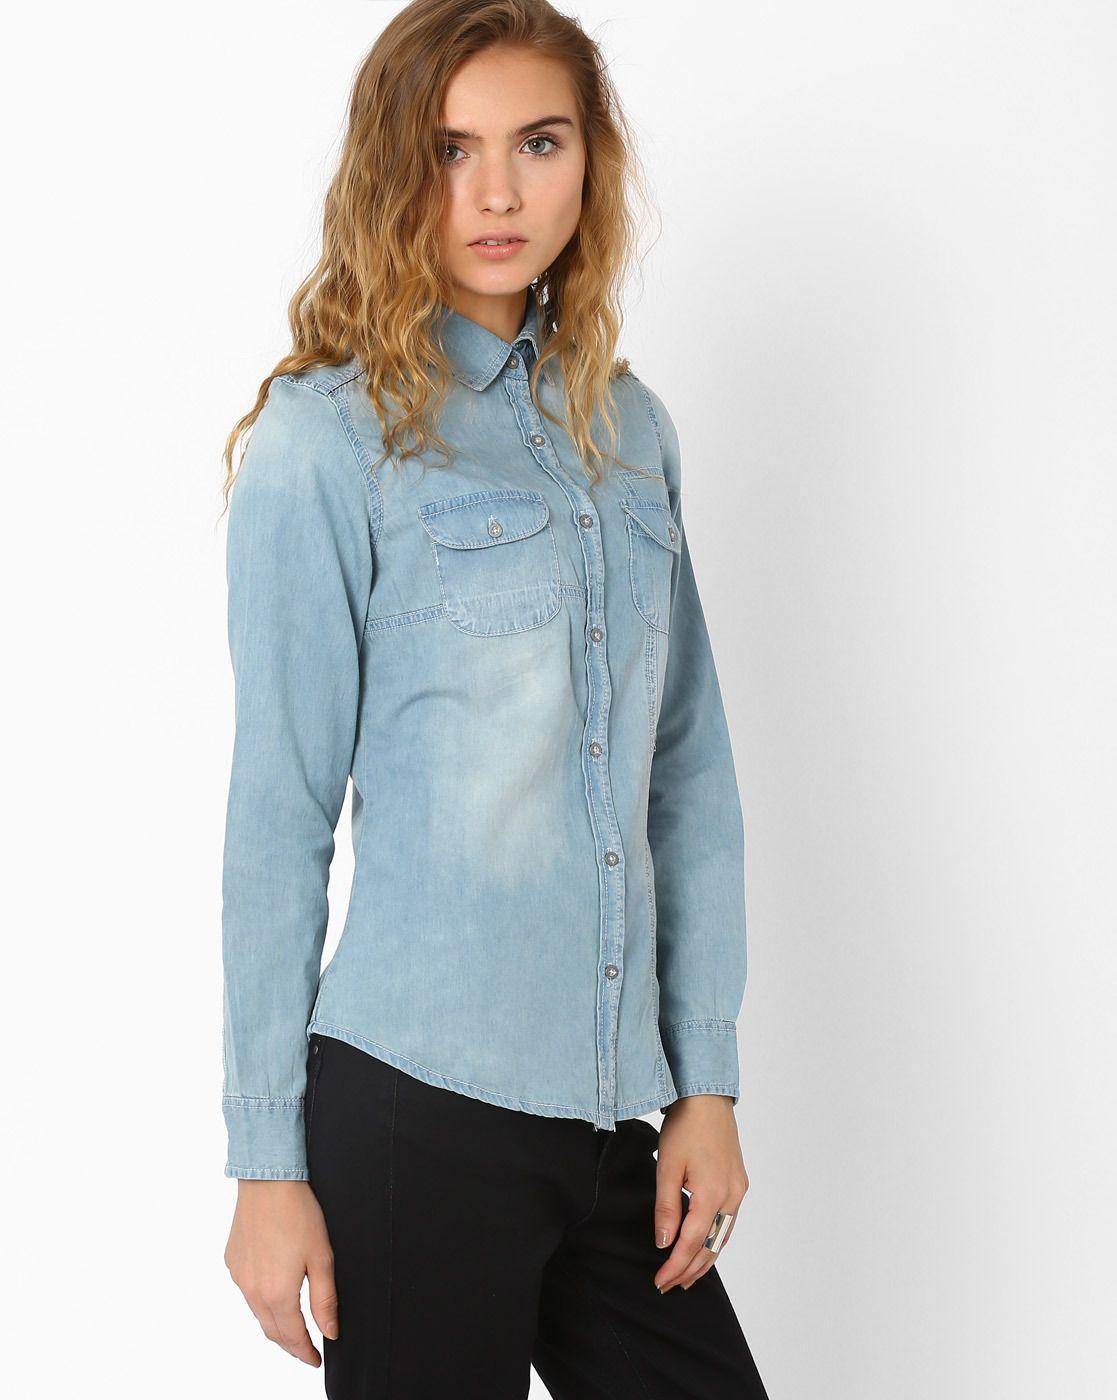 Denim Shirt With Flap Pockets Western Wear For Women Denim